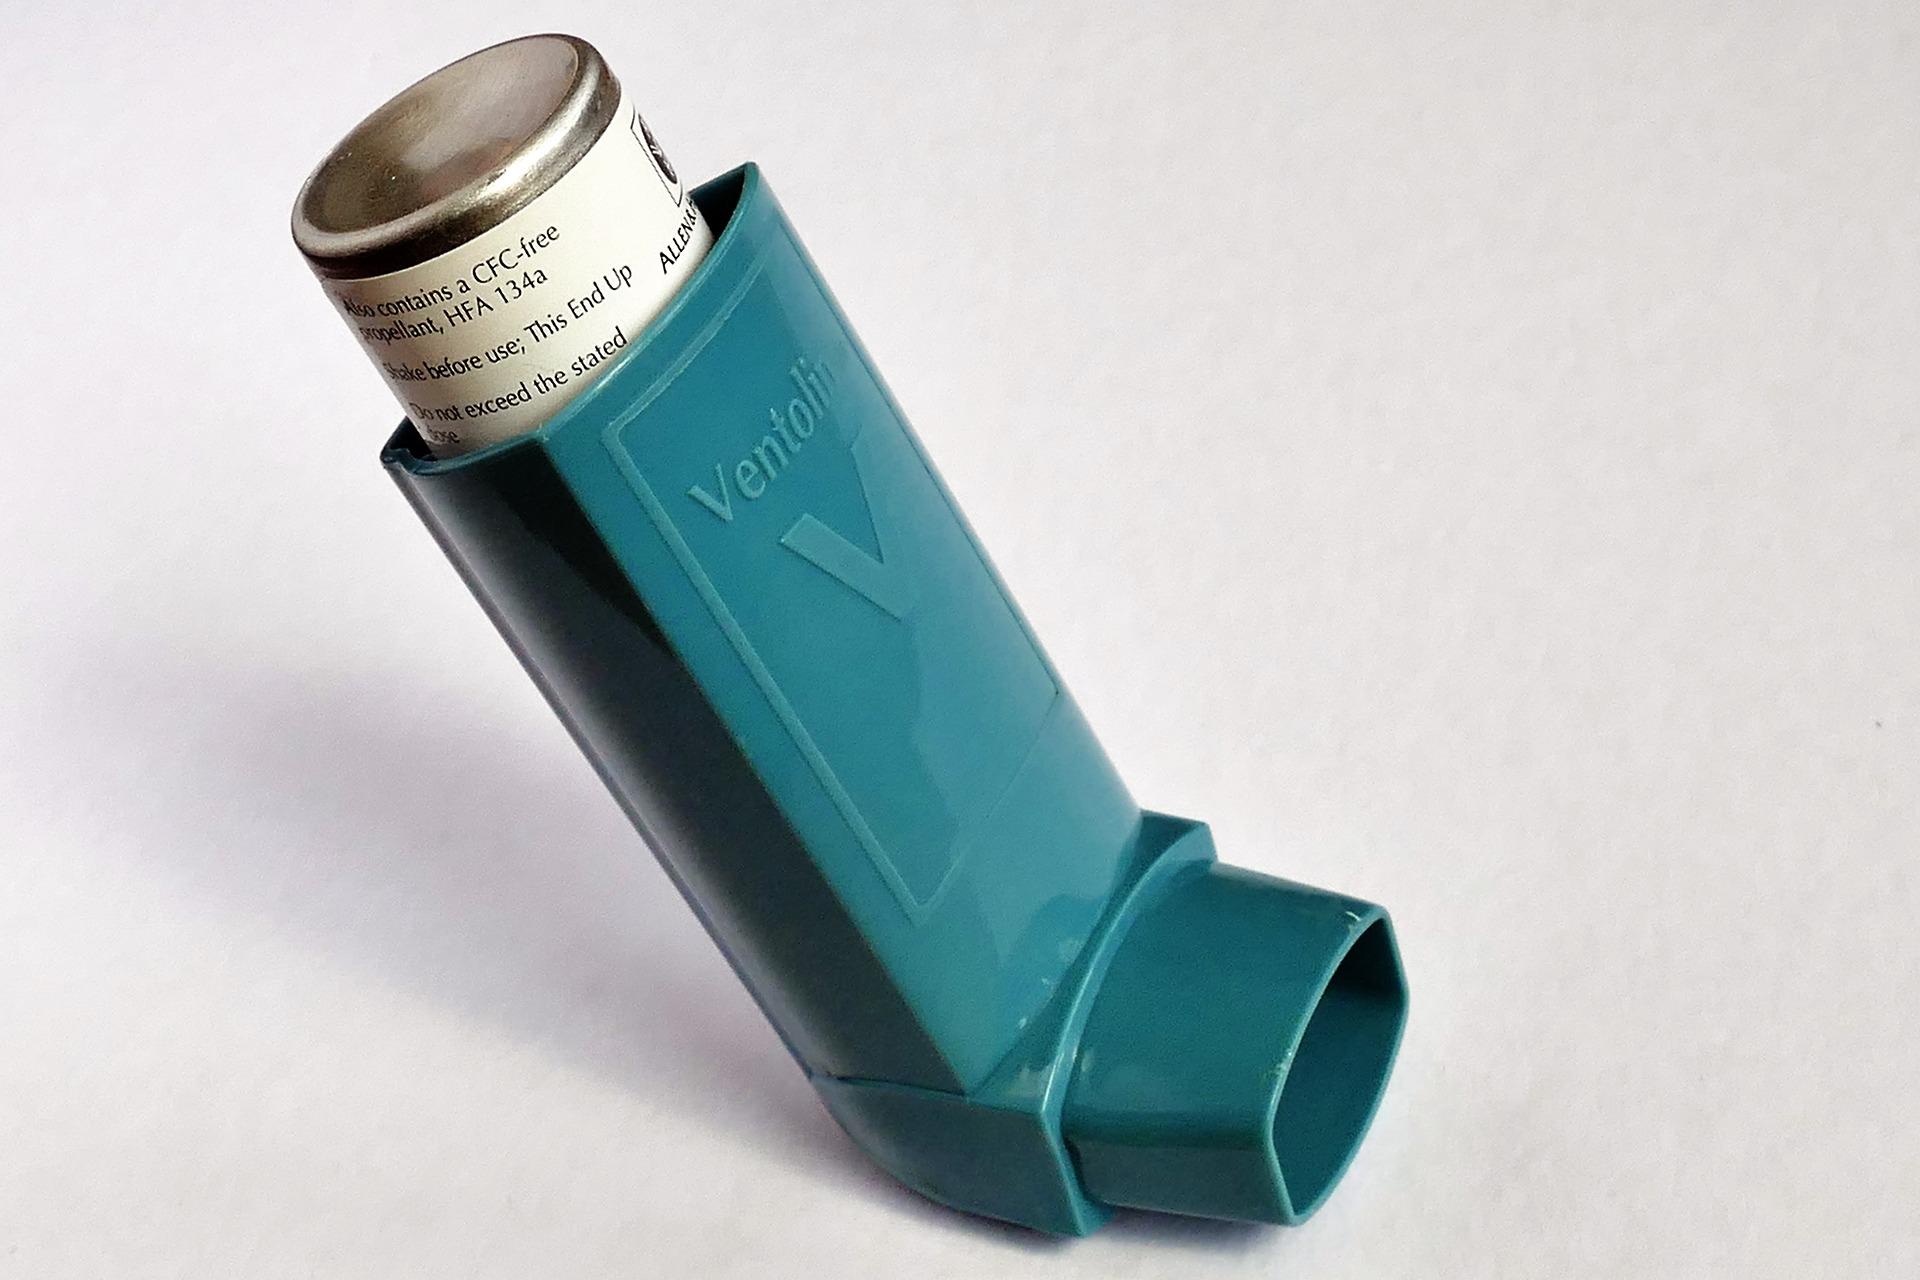 Breathing sprayer